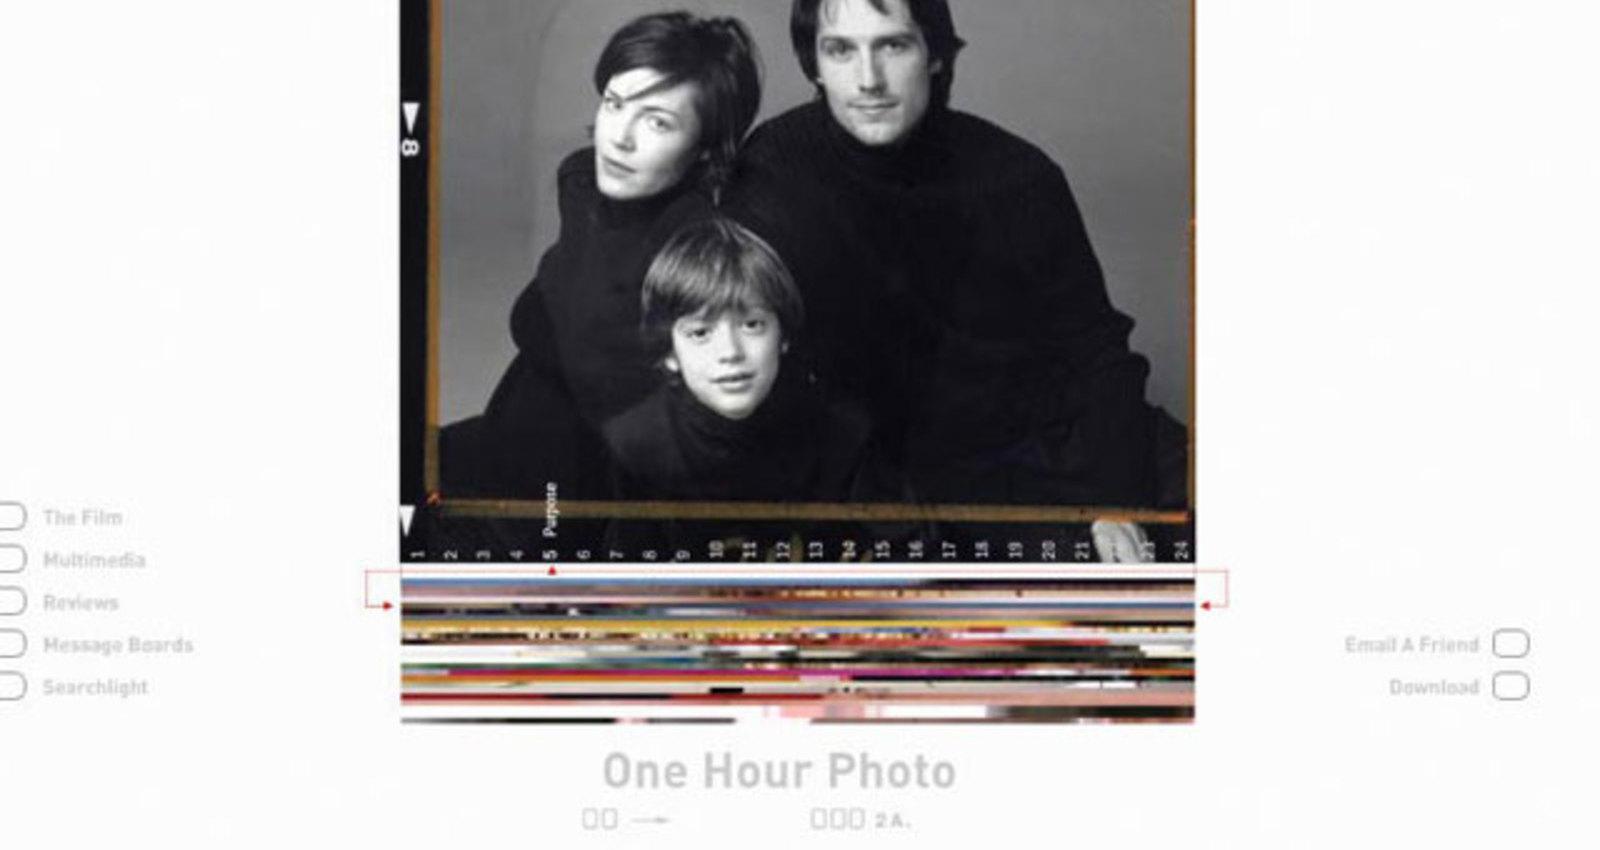 One Hour Photo Web Site